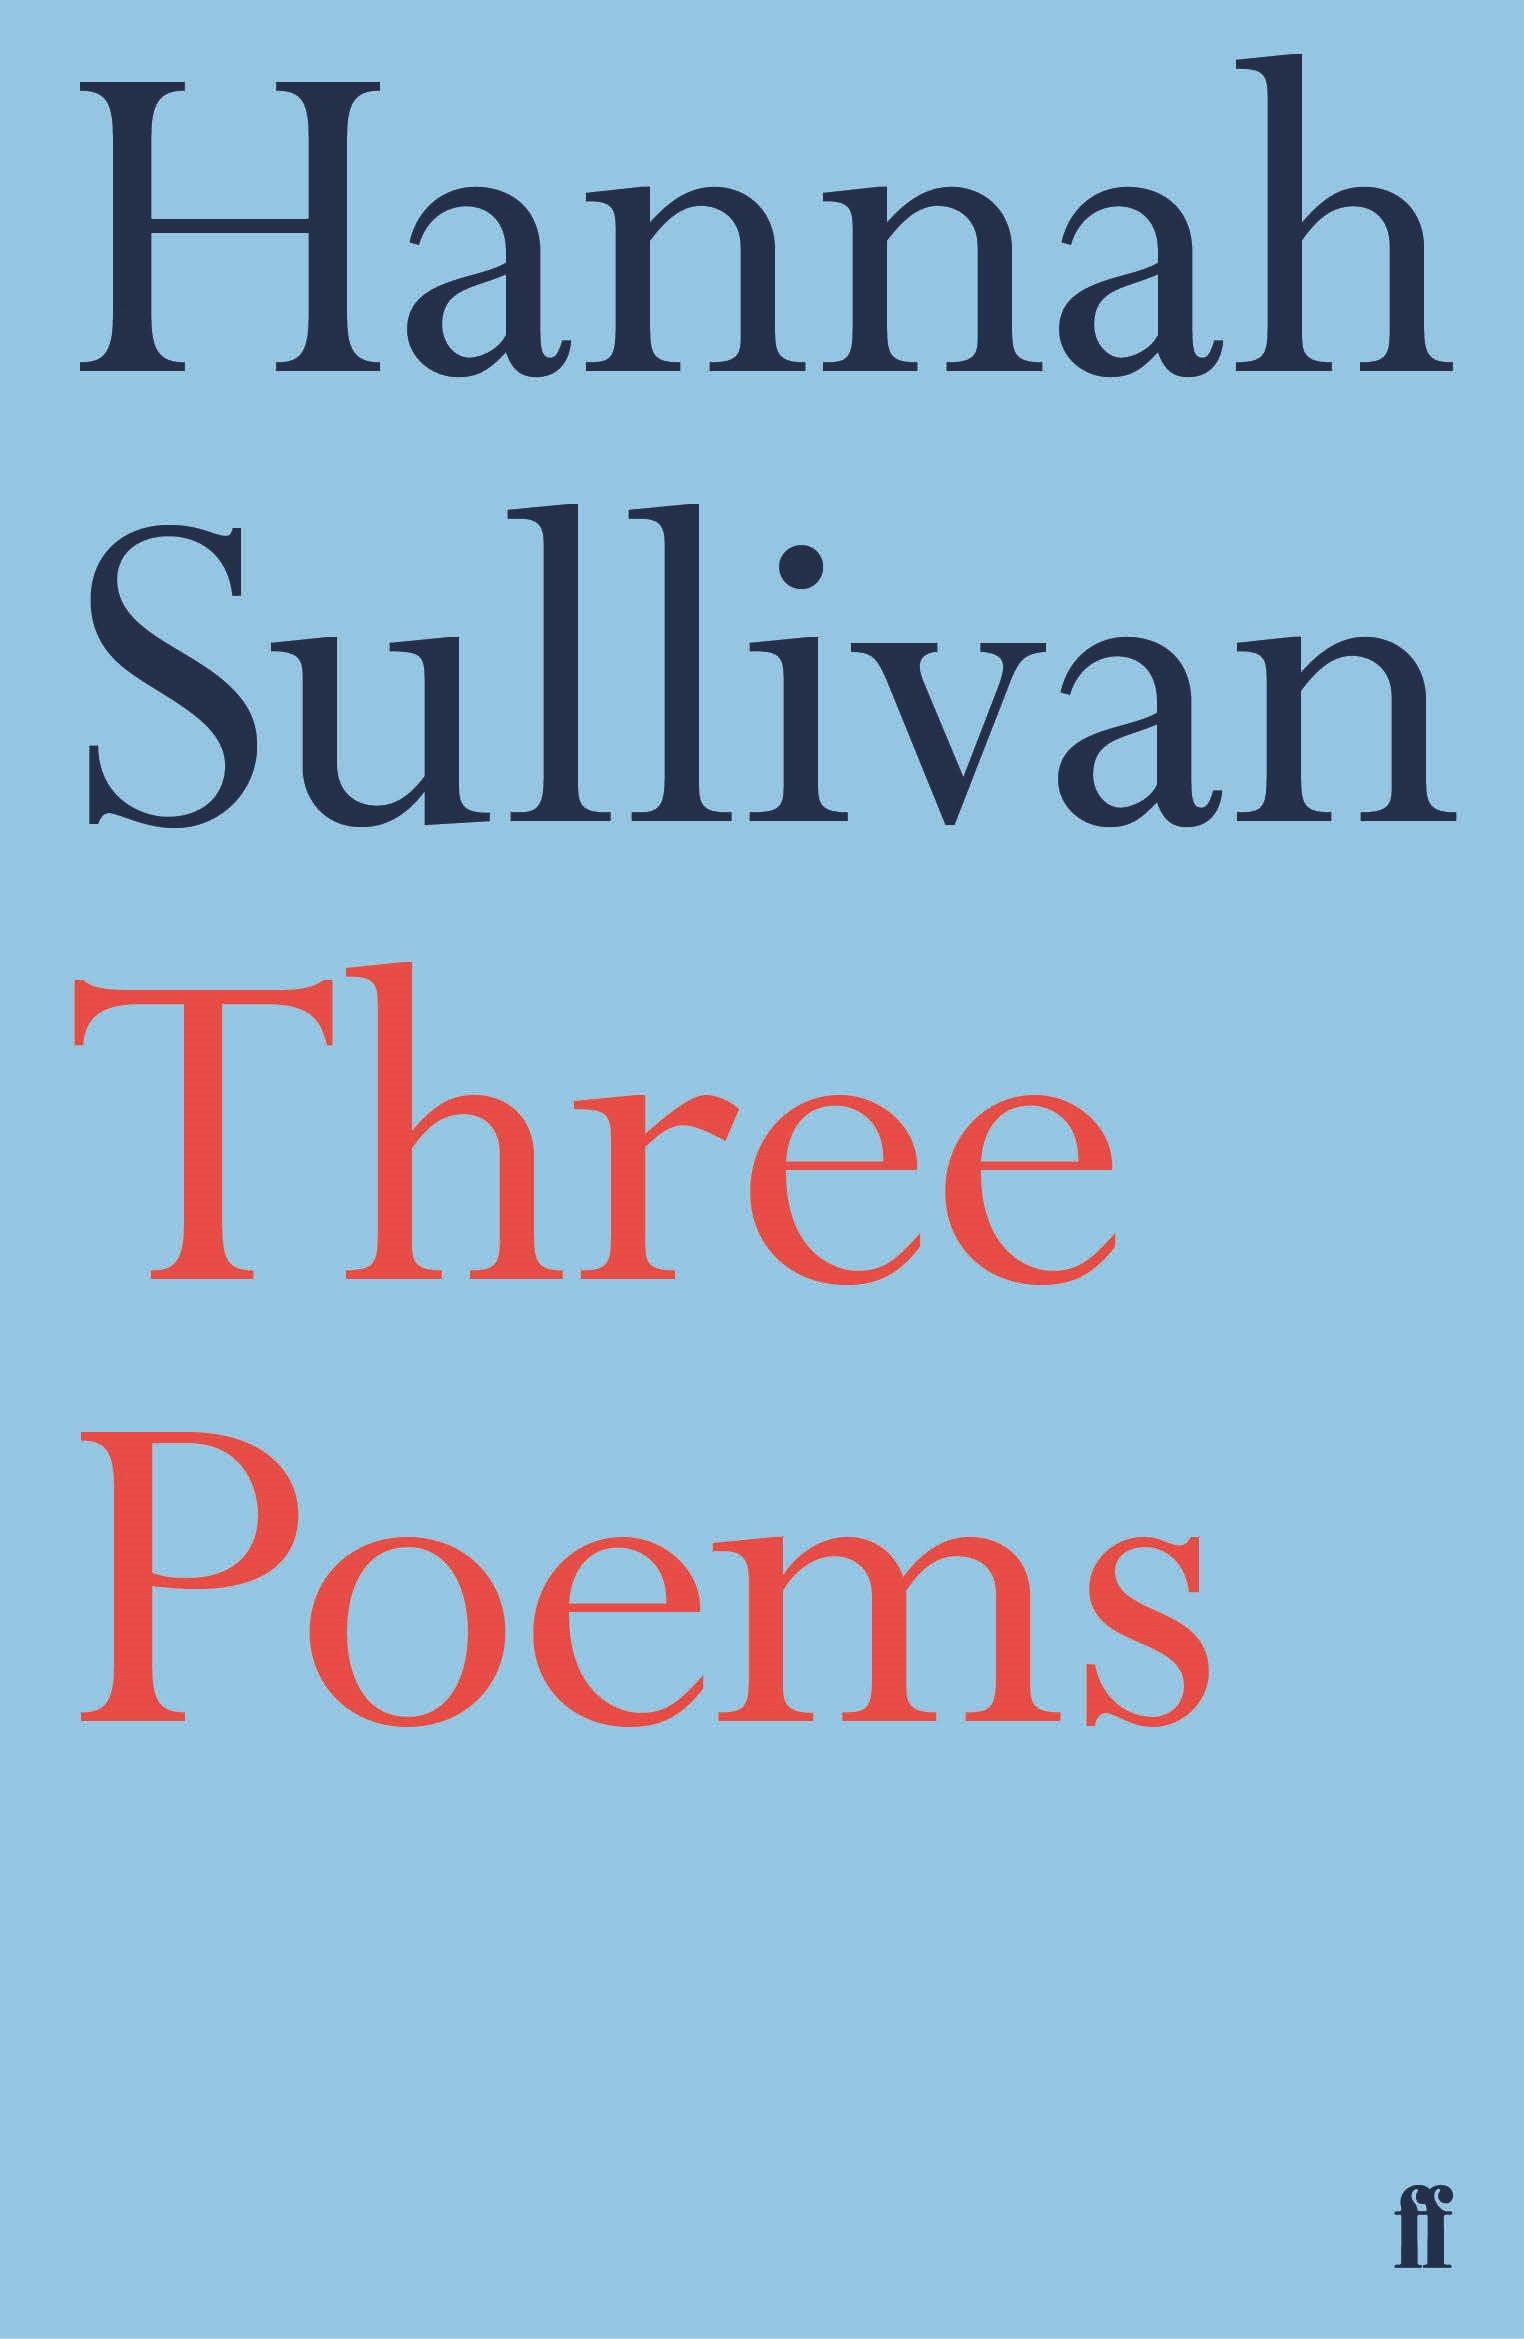 Hannah Sullivan, Three Poems. Courtesy Faber & Faber